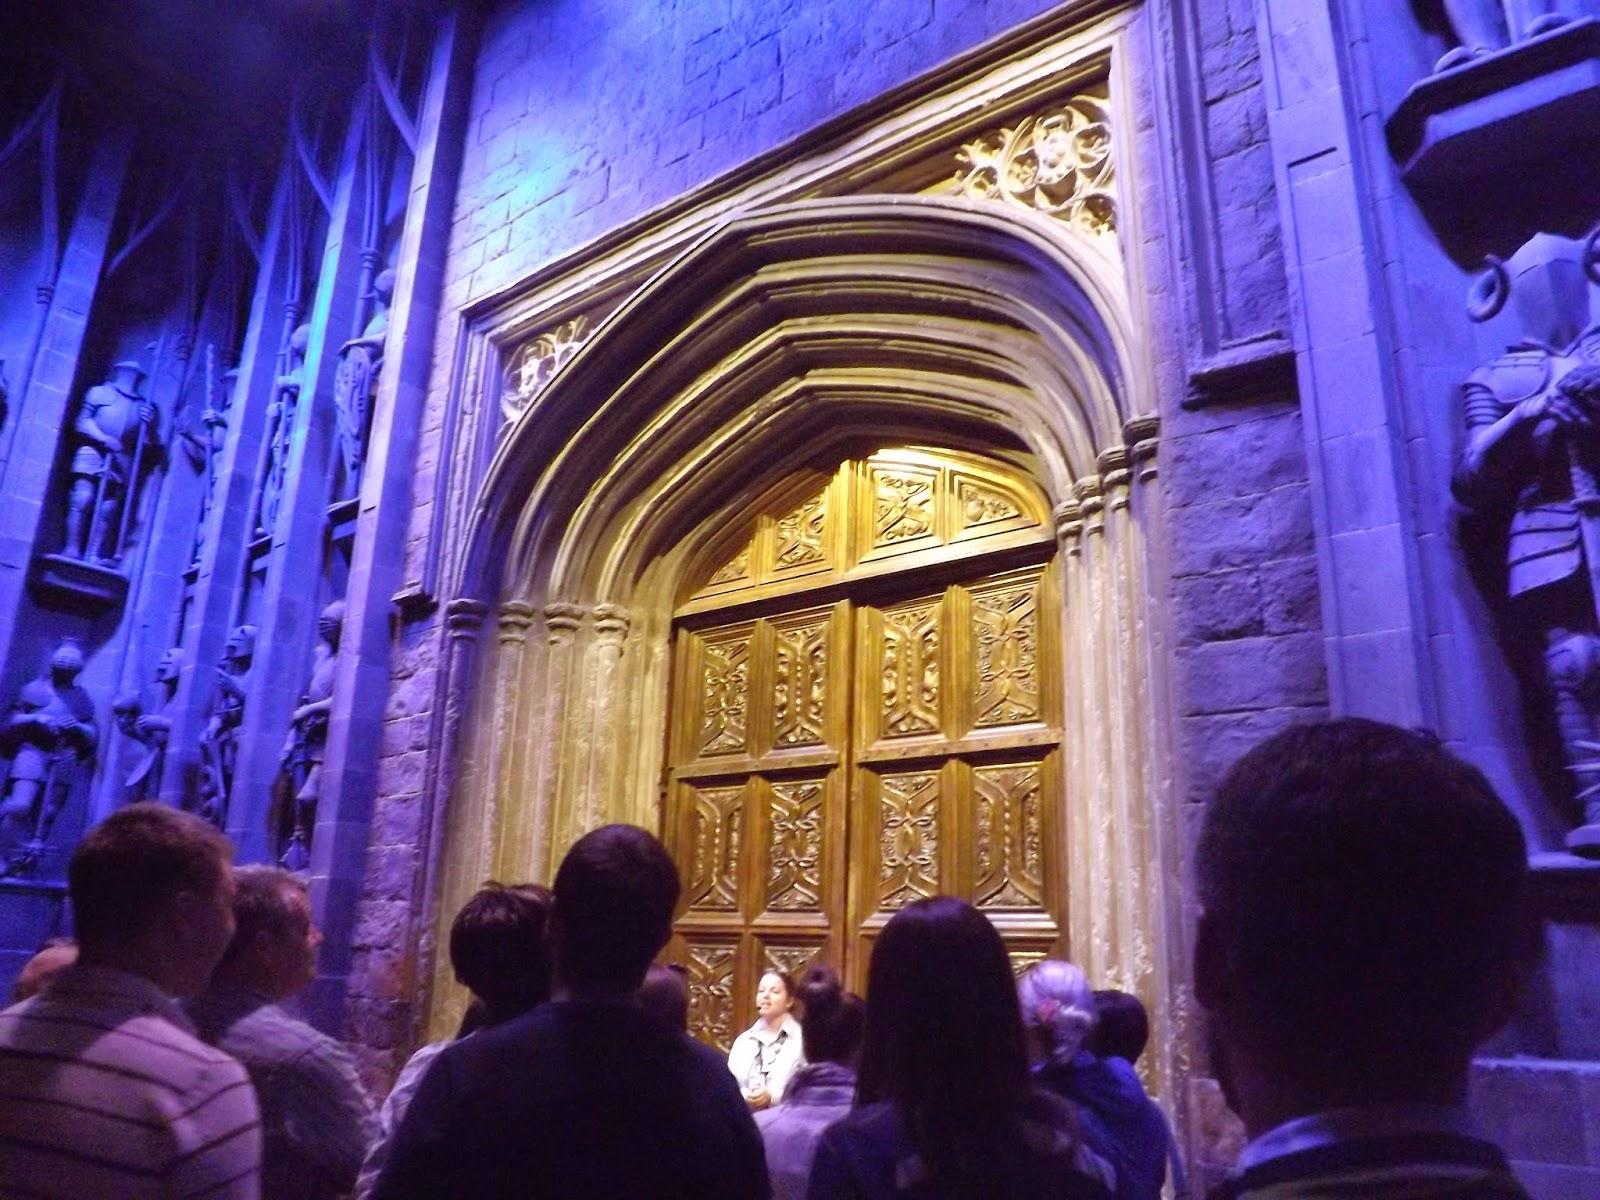 Most Inspiring Wallpaper Harry Potter Dining Hall - London\u0026Harry+Potter+172  Best Photo Reference_19249.JPG